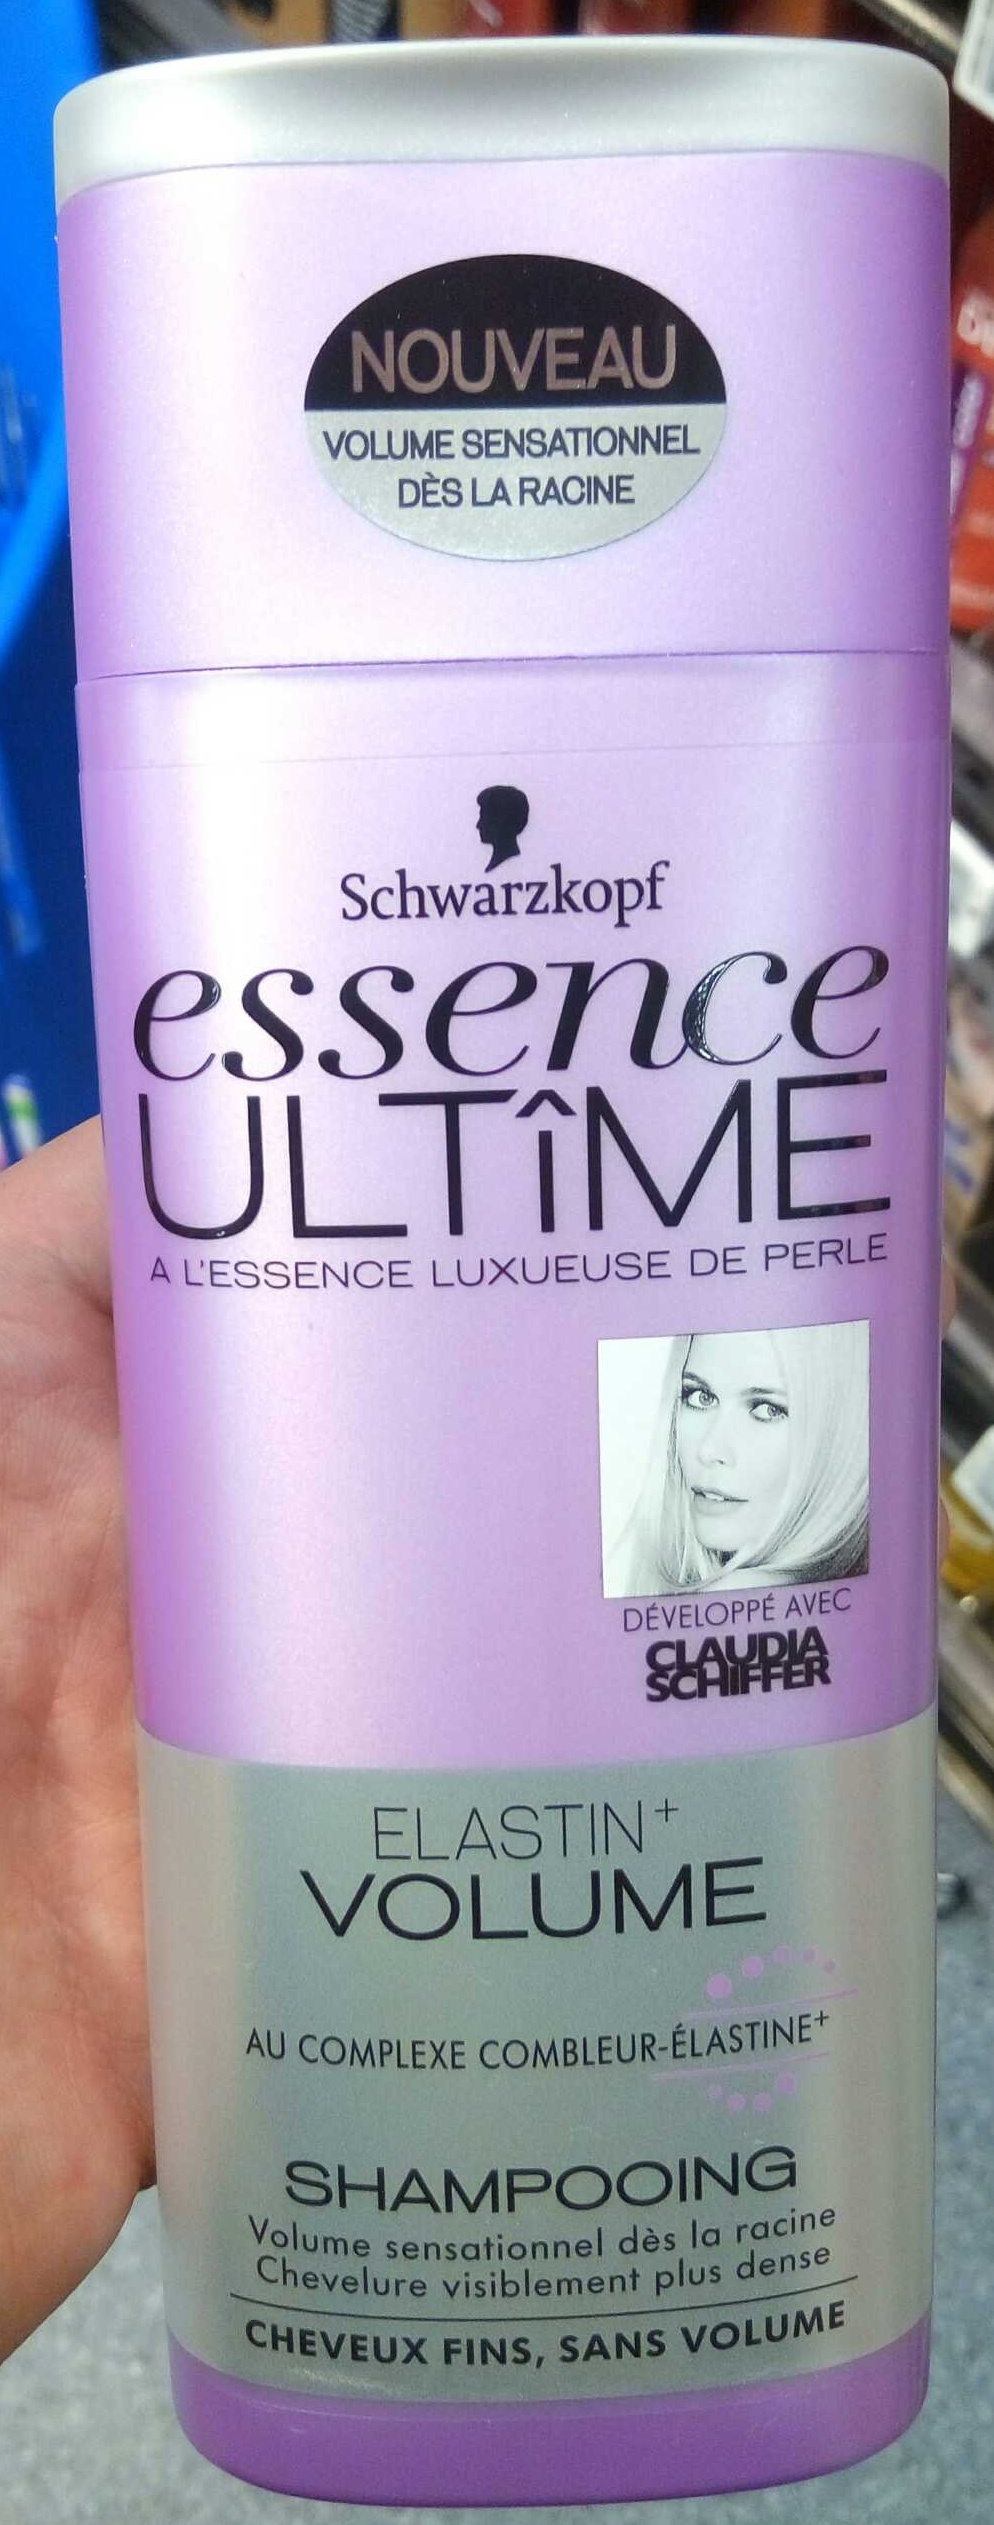 Essence Ultîme Elastin Volume Shampooing - Product - fr